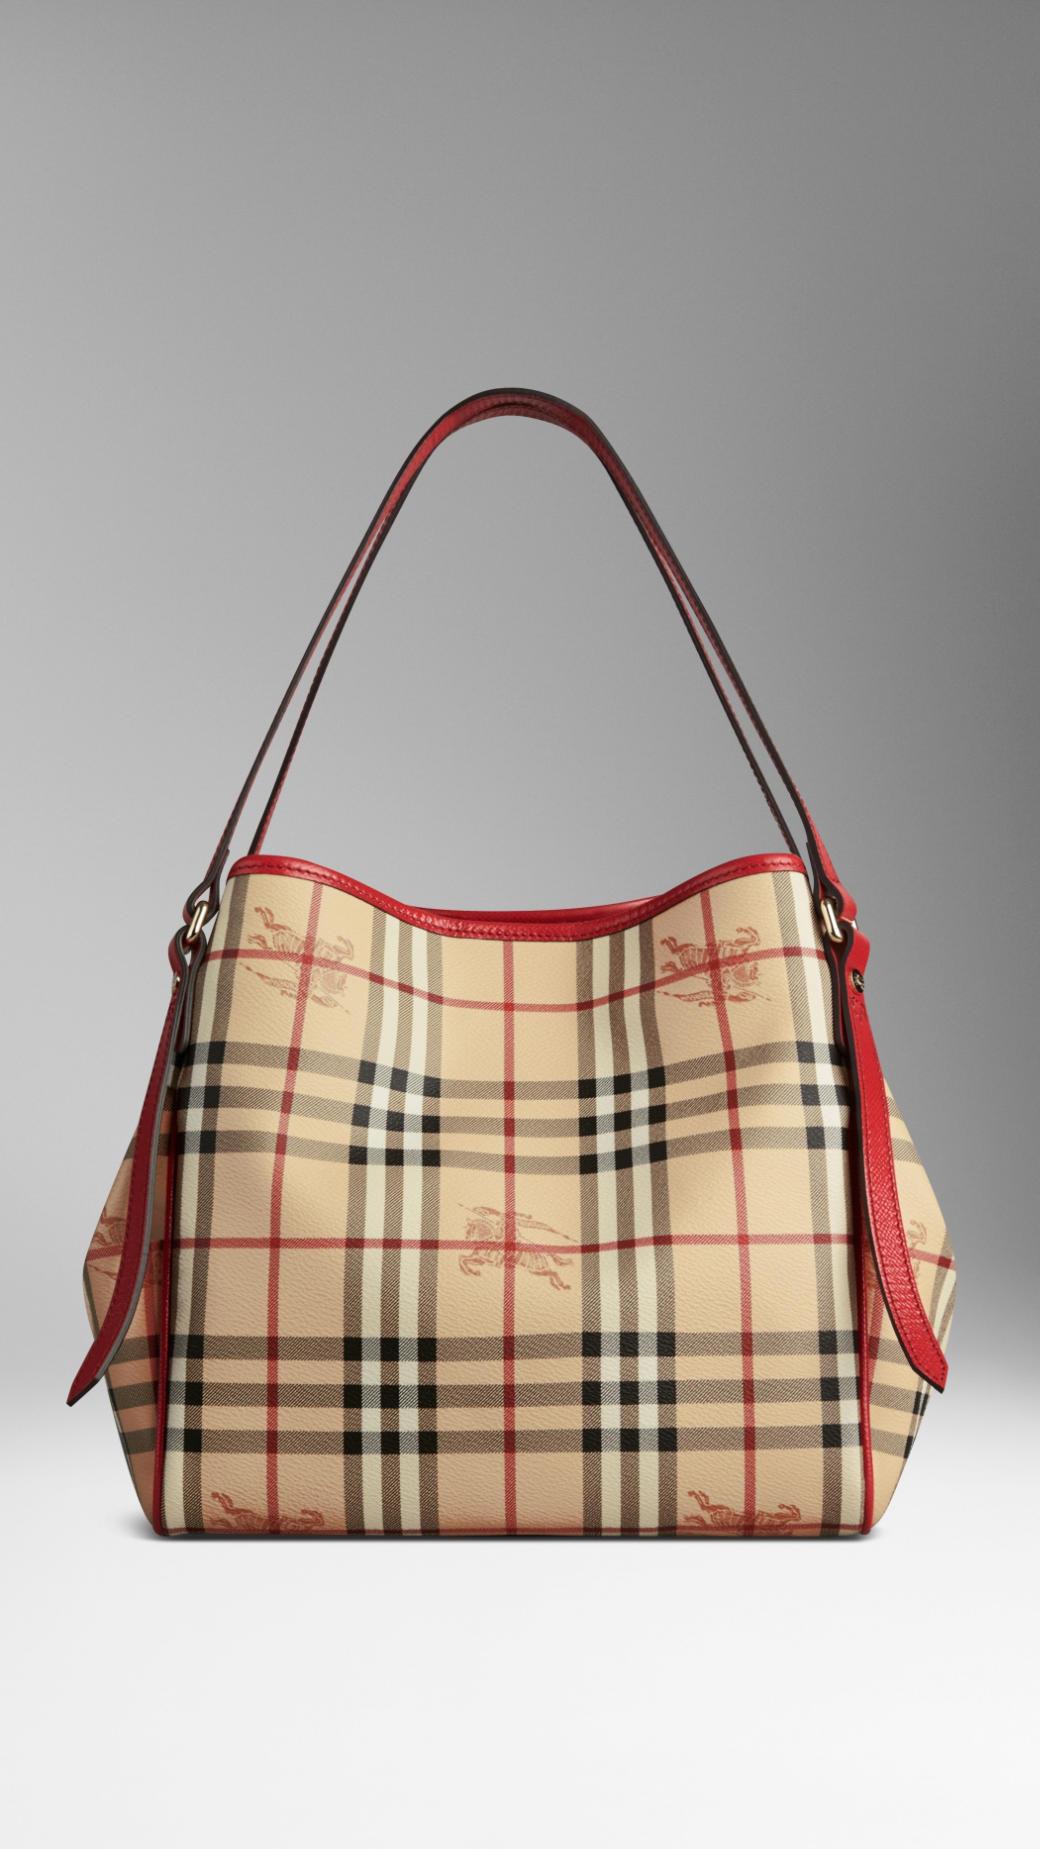 3d5f22355a10 Burberry Check Handbag - Foto Handbag All Collections Salonagafiya.Com